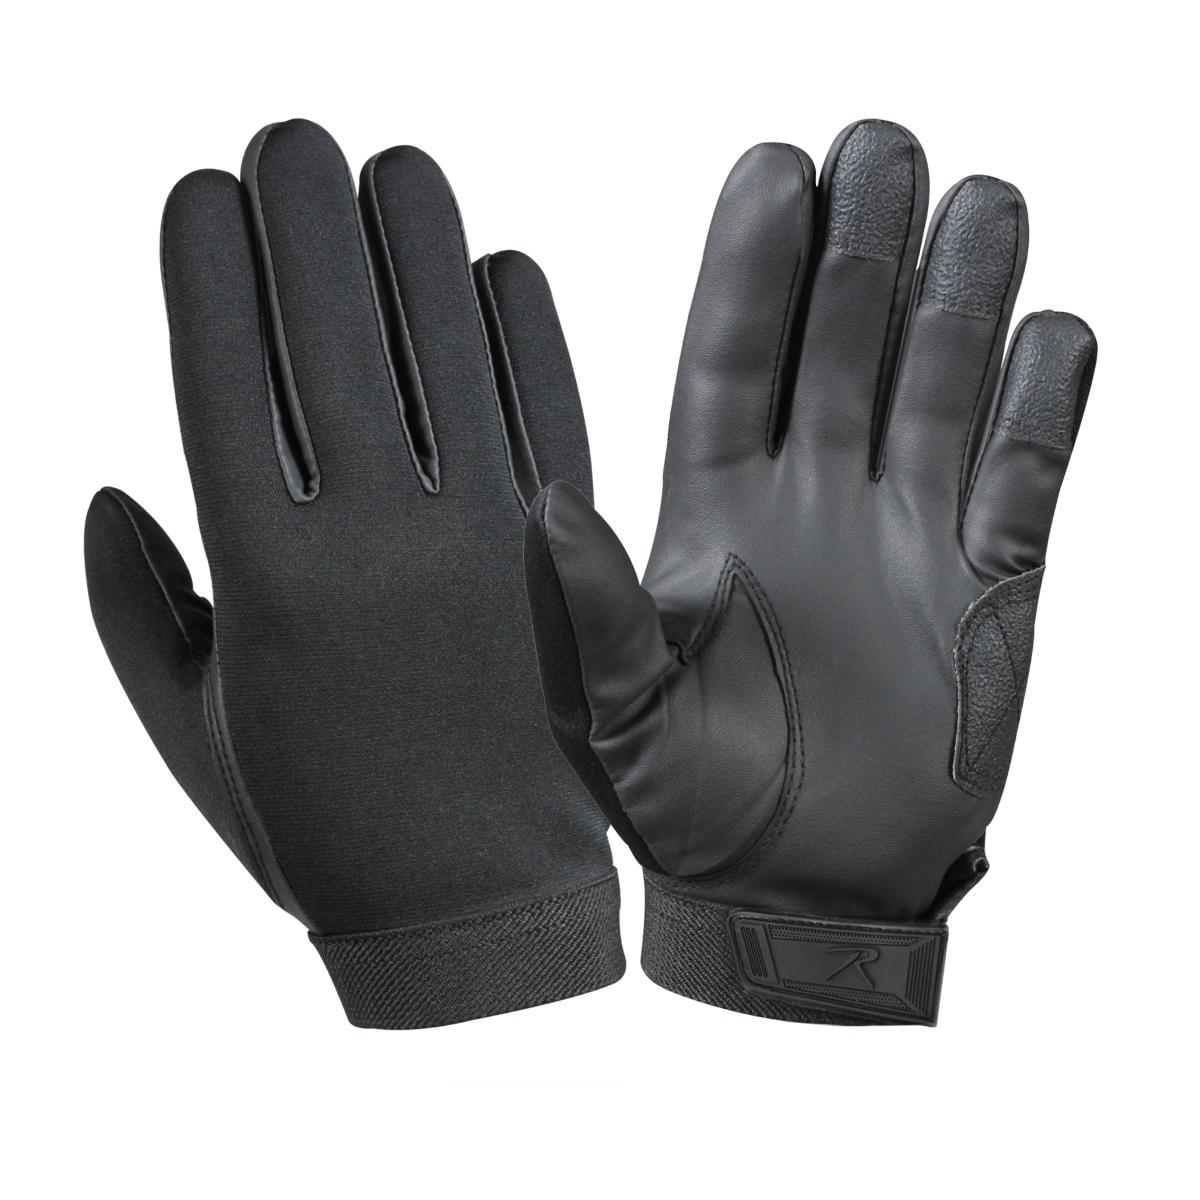 Black Neoprene Gloves by Rothco